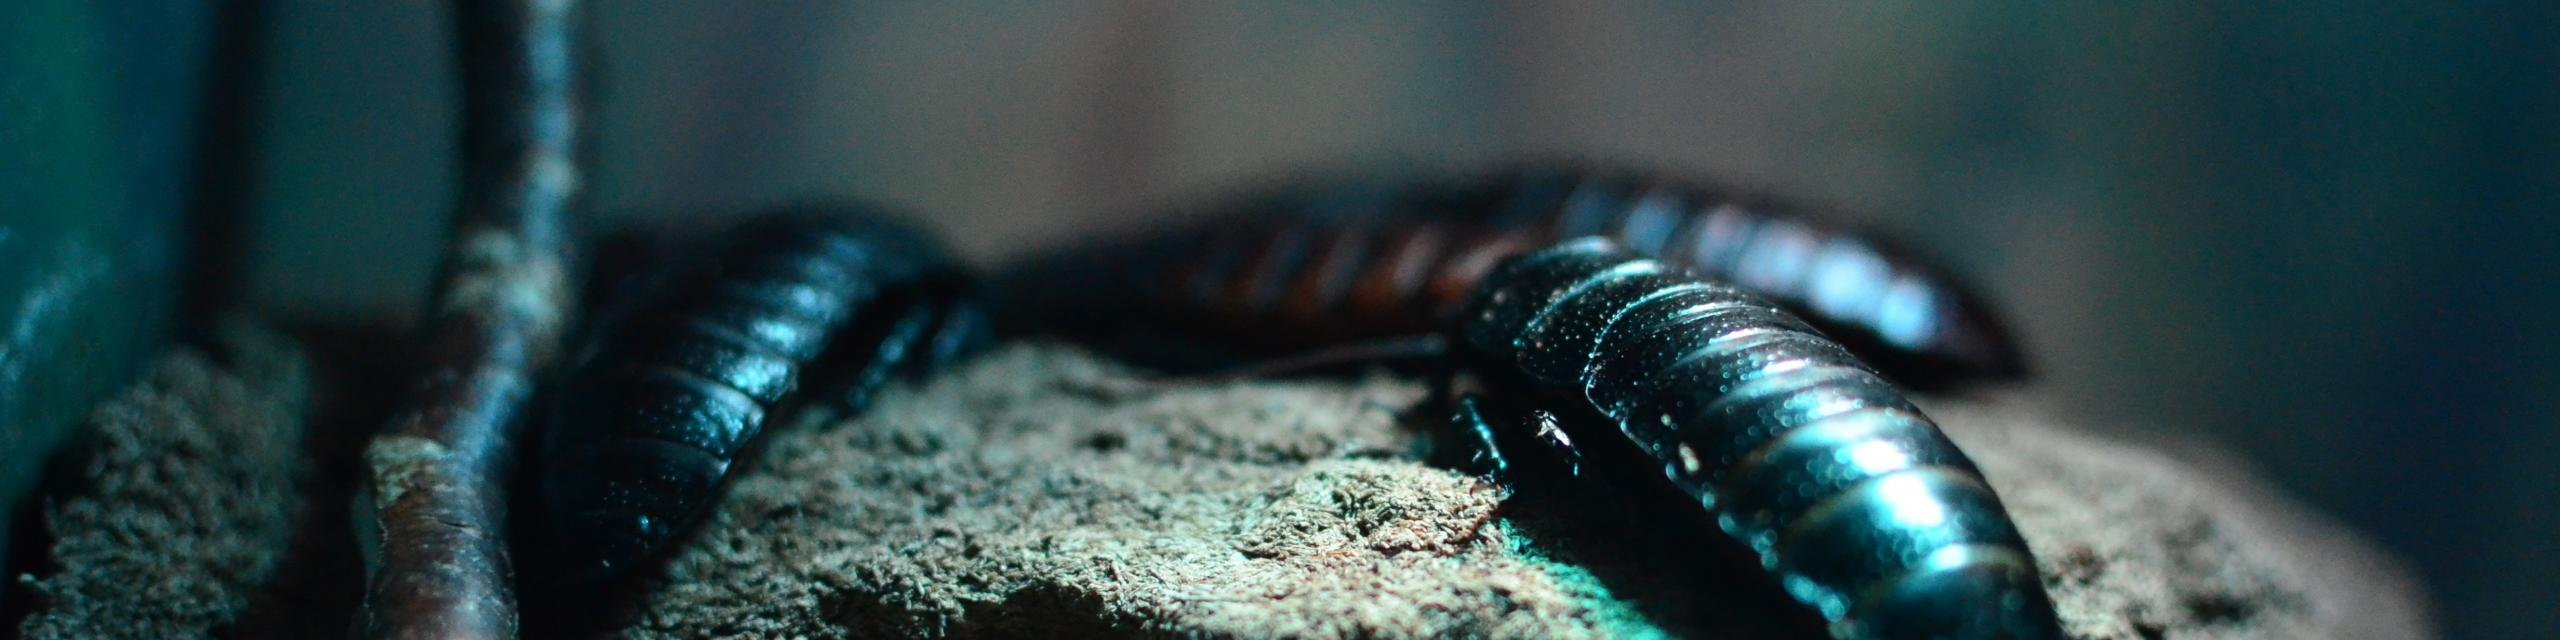 Cockroaches - Humboldt Termite & Pest Control